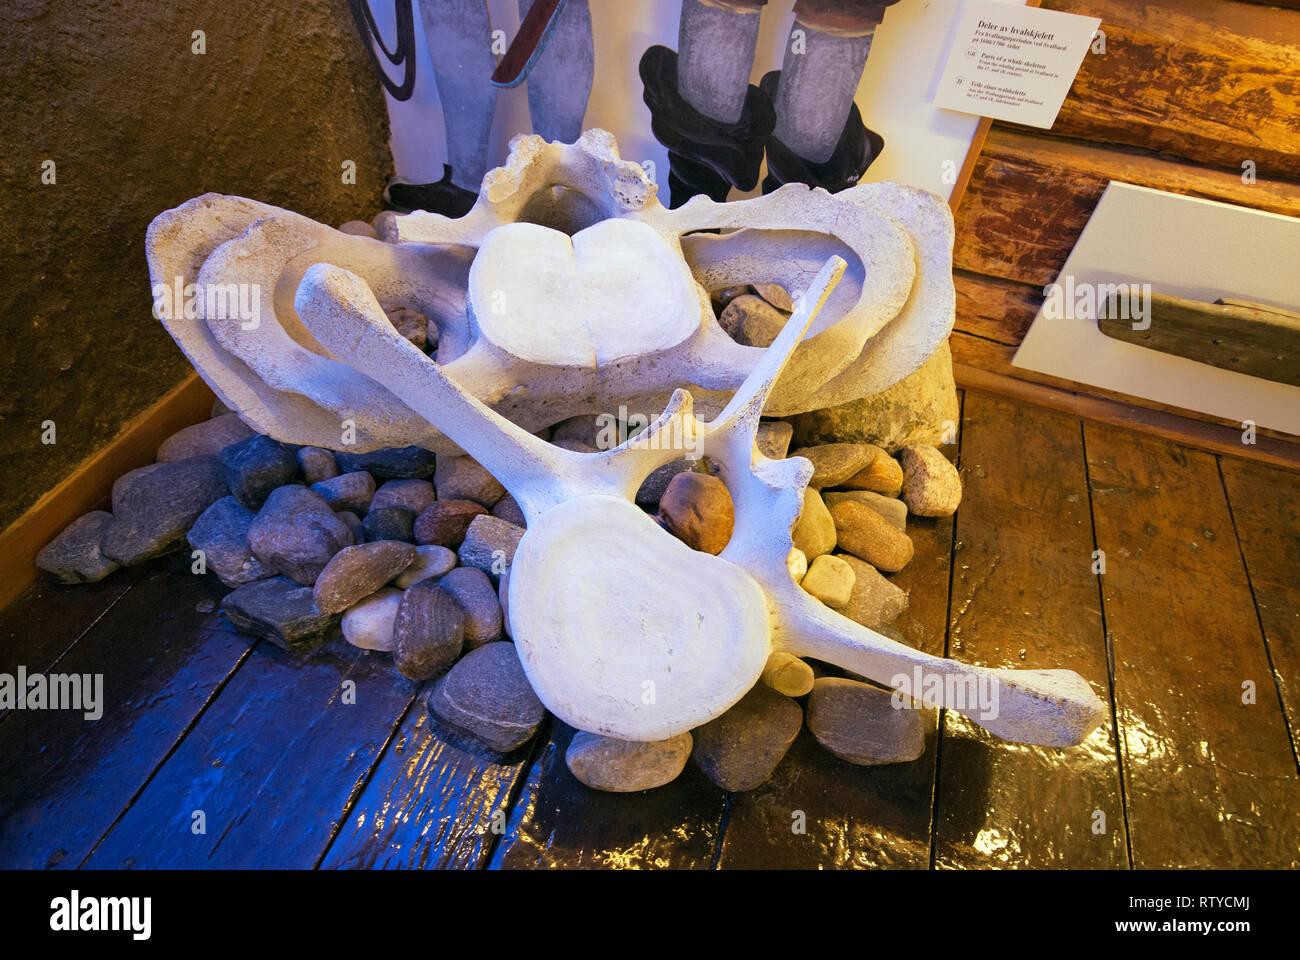 Whale's vertebras at Polar Museum (Polarmuseet) in Tromso, Troms County, Norway - Stock Image